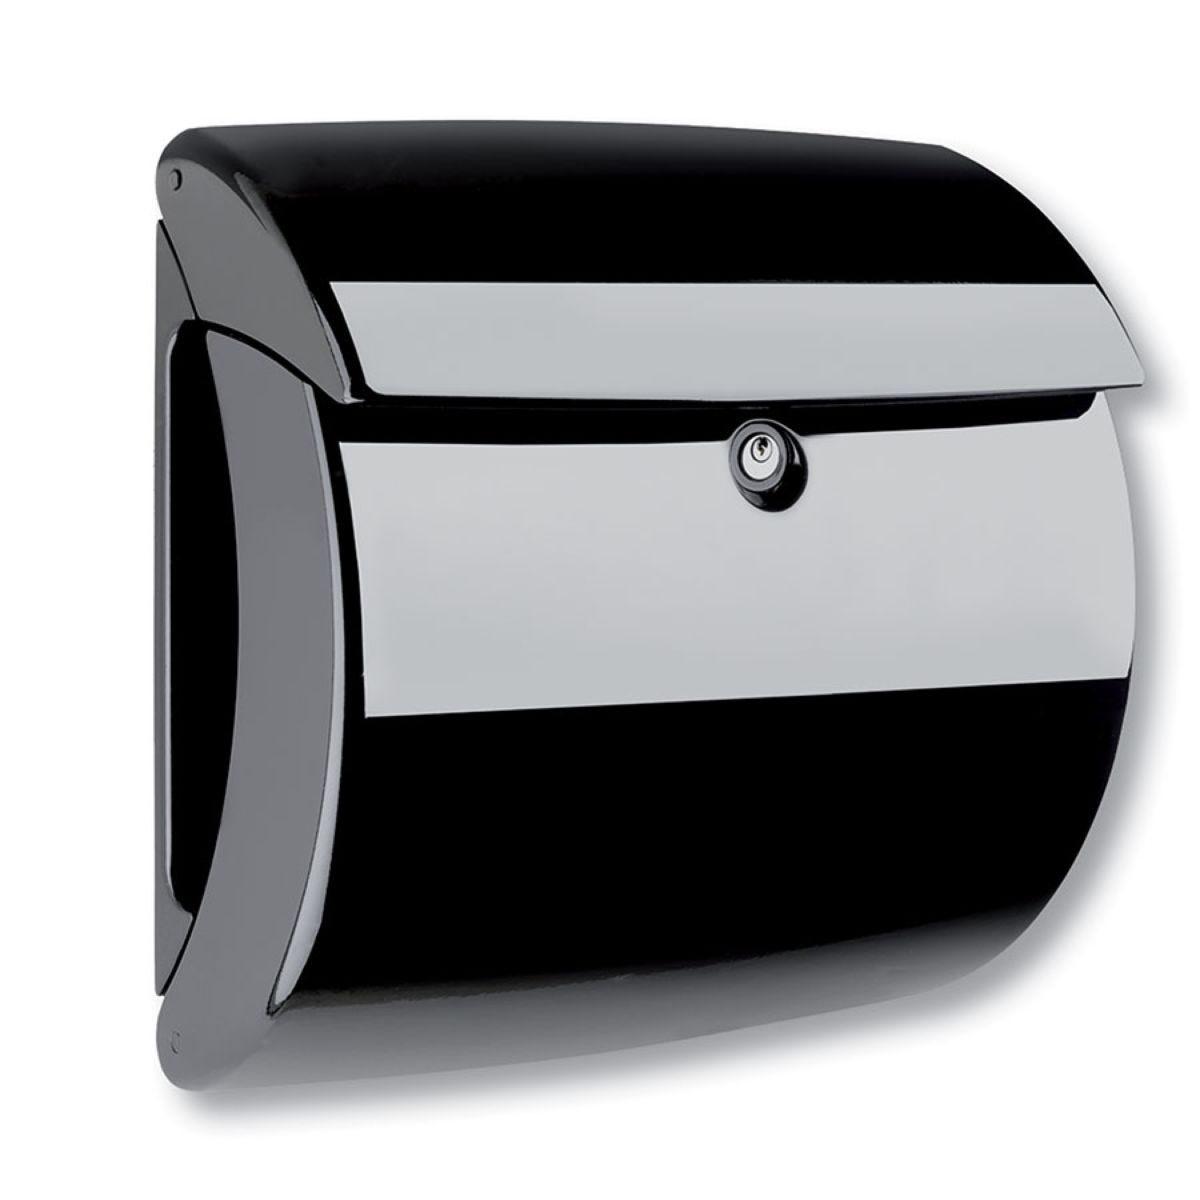 Burg-Wachter Piano Post Box - Black